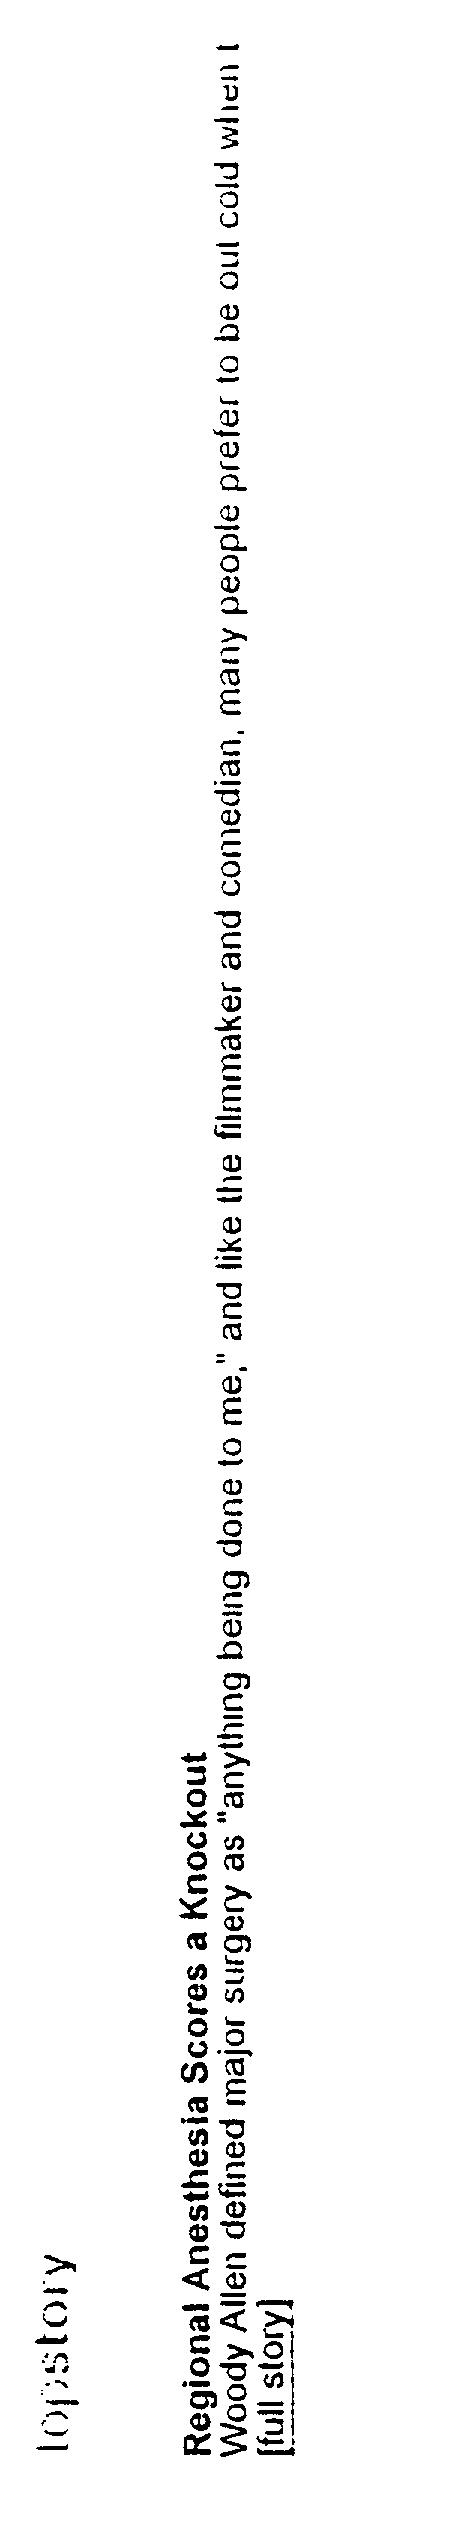 Figure US20020149616A1-20021017-P00191